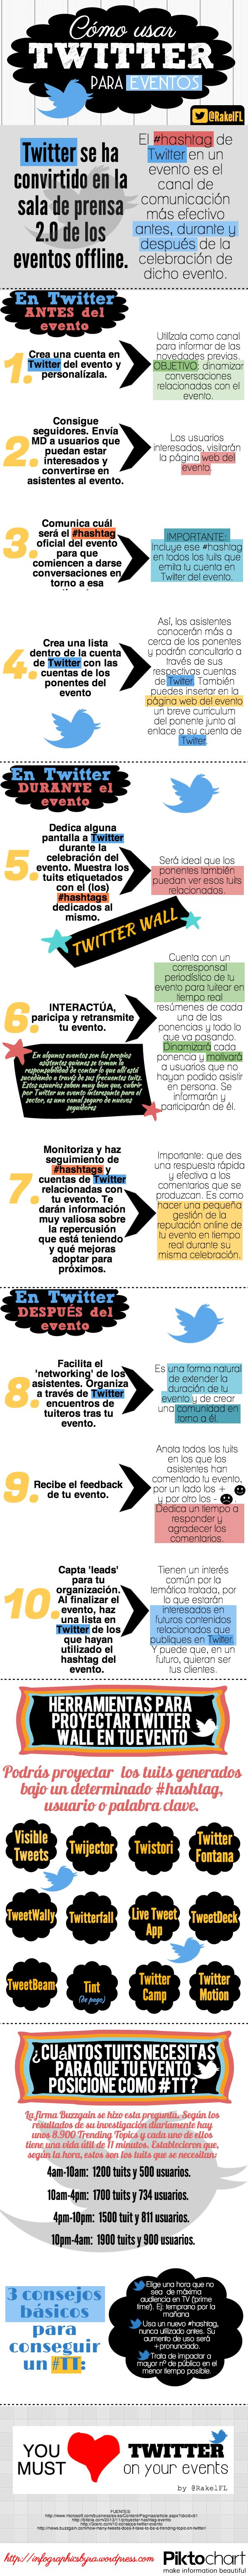 Cómo usar Twitter para eventos. Guía básica.